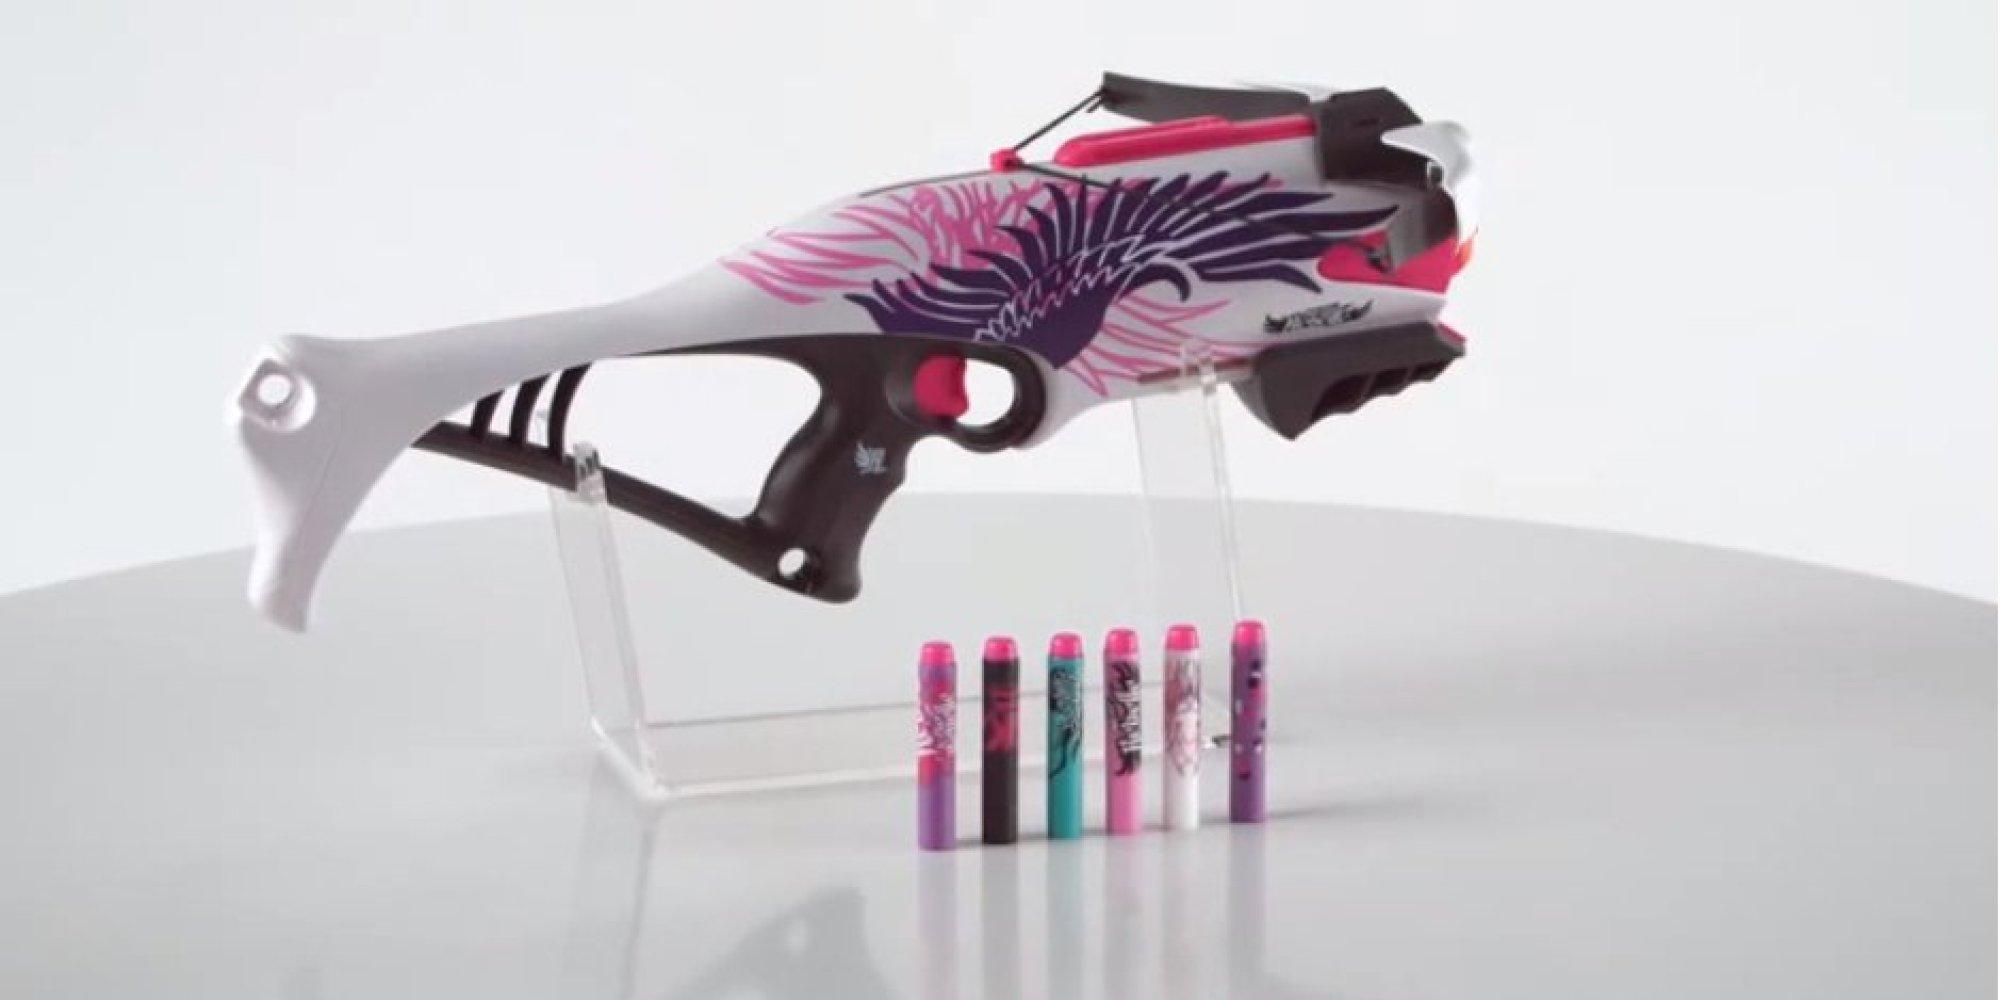 Nerf Boys Toys For Girls : Are nerf s rebelle archery toys for girls sexist huffpost